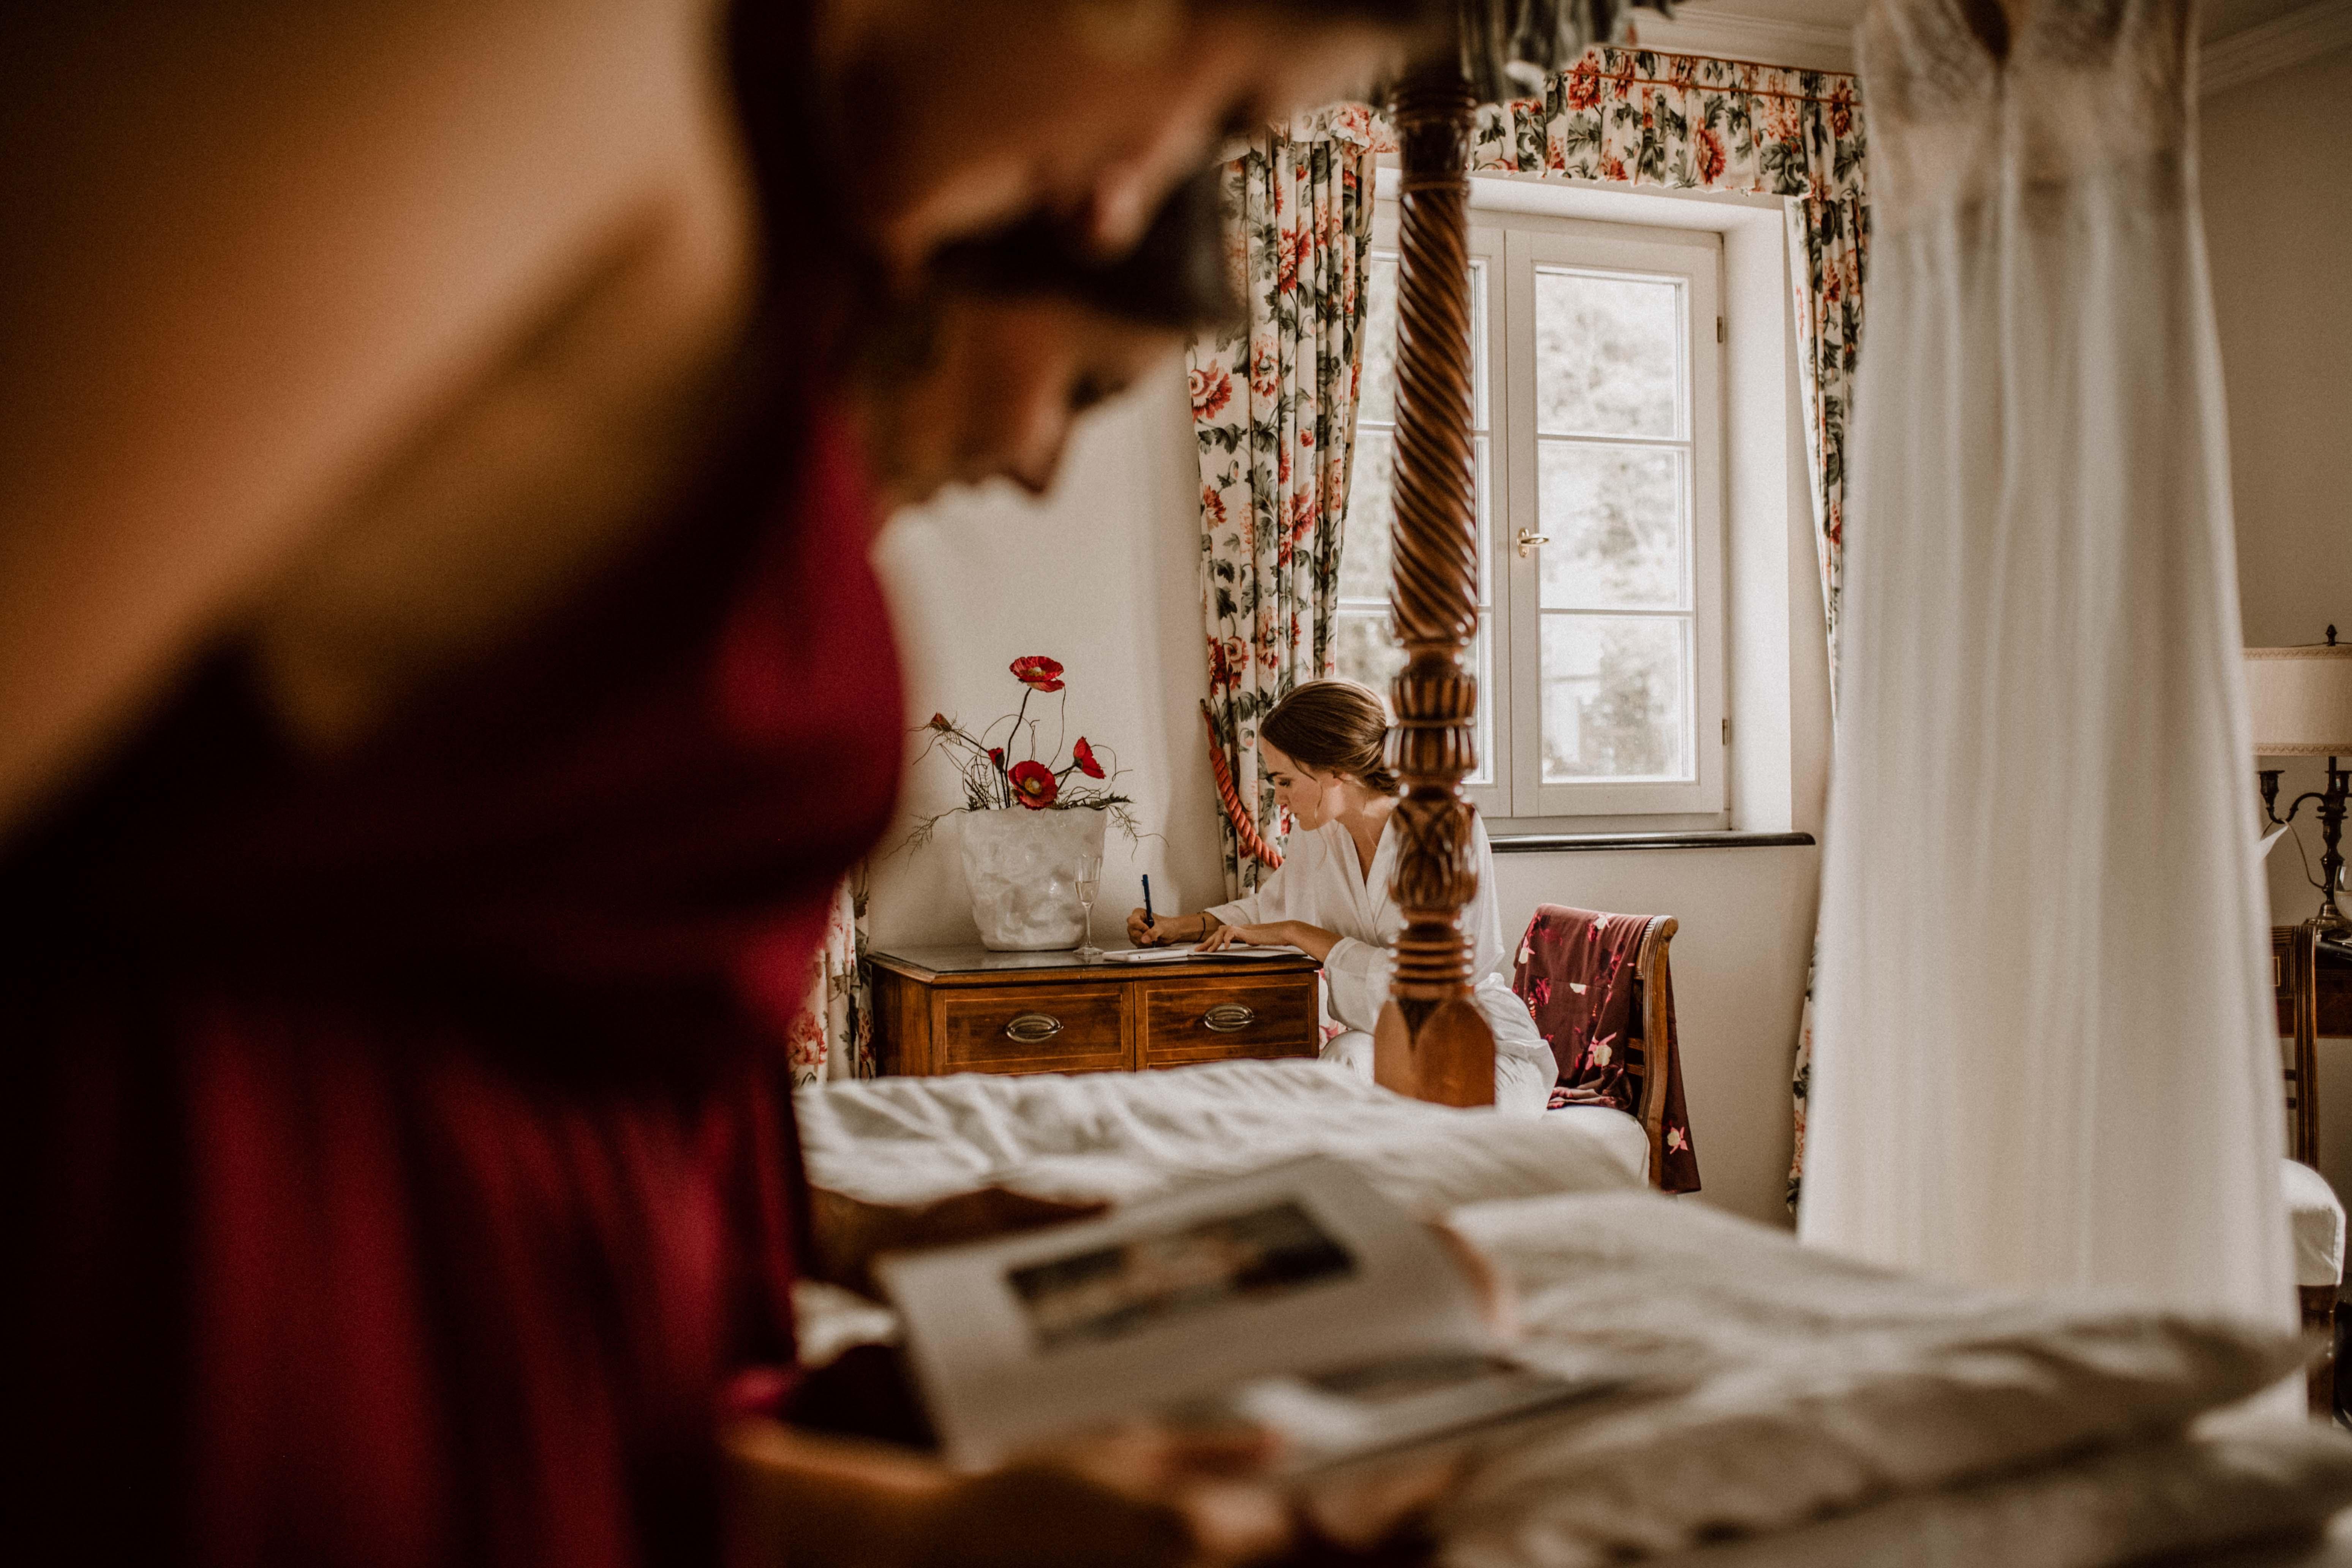 ehegelübde vows sonja poehlmann photography couples muenchen bayern